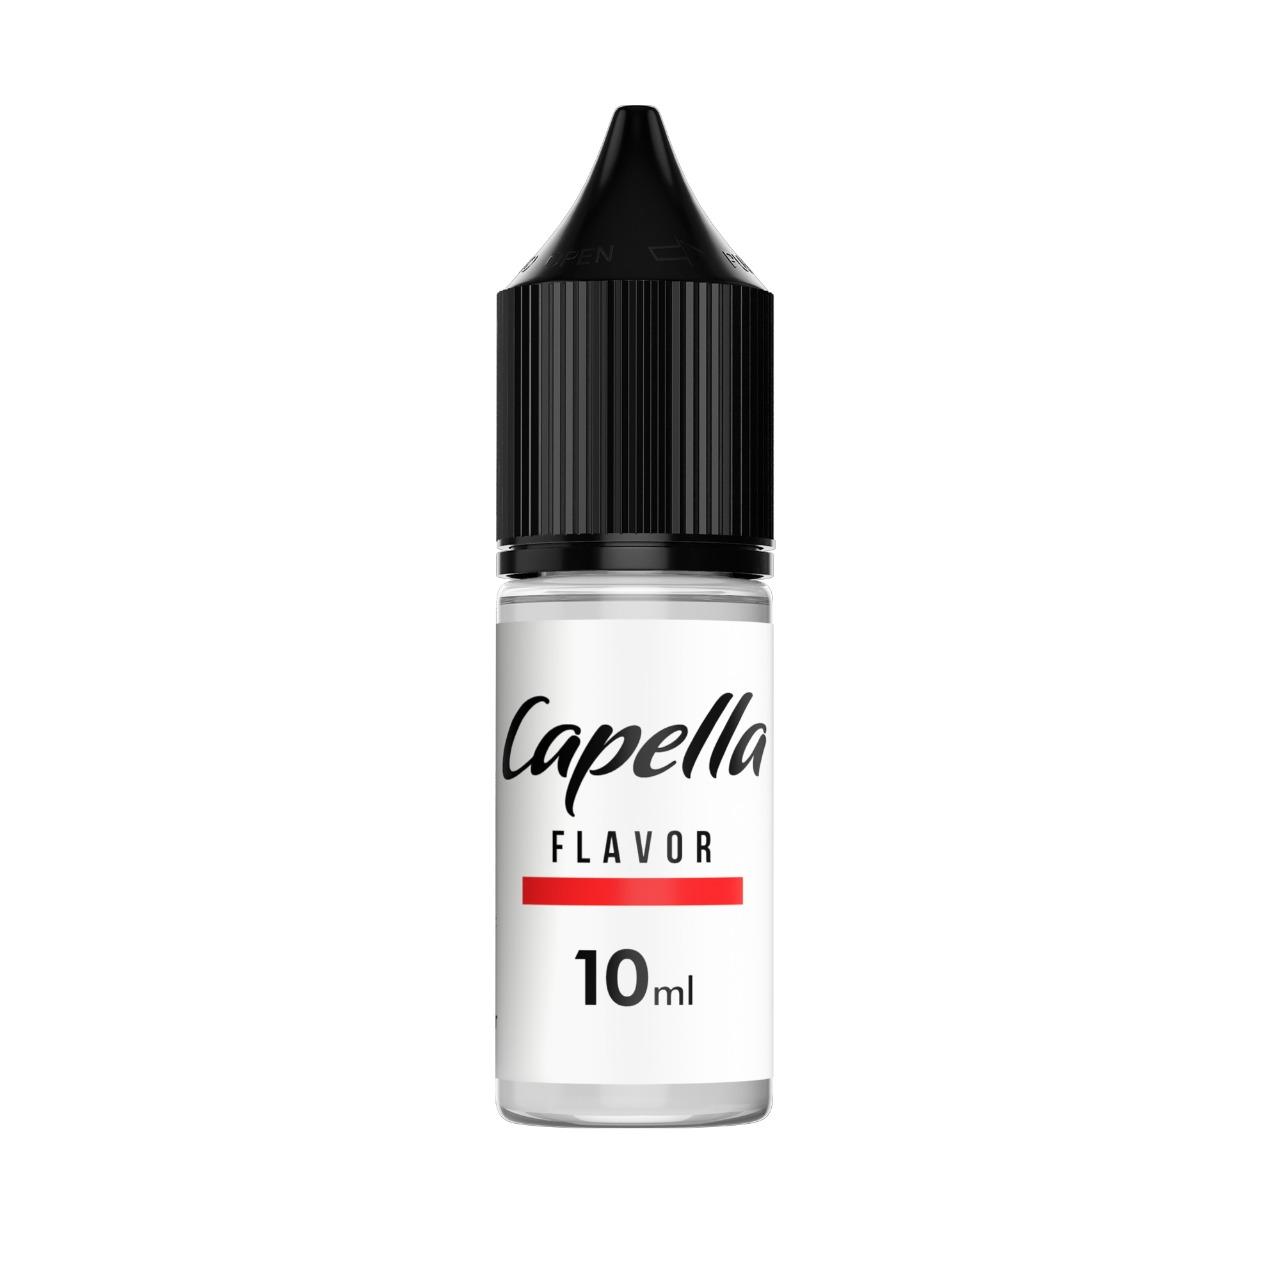 Capella (CAP) Lemon Meringue Pie 10ml  - VM Labs